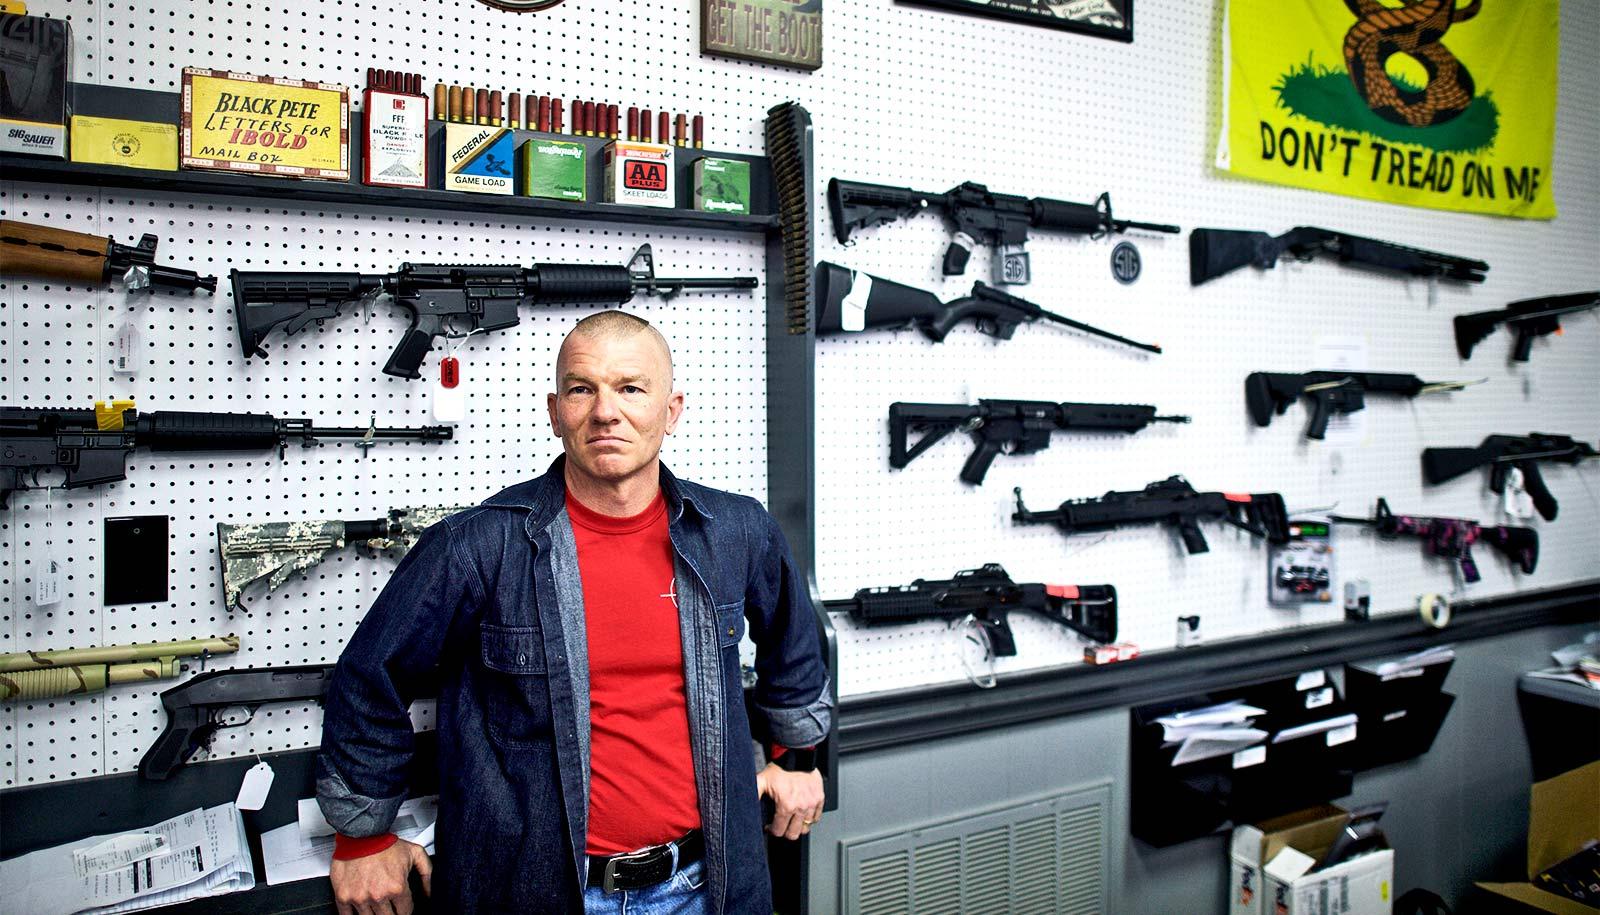 Gun retailers could help prevent suicide